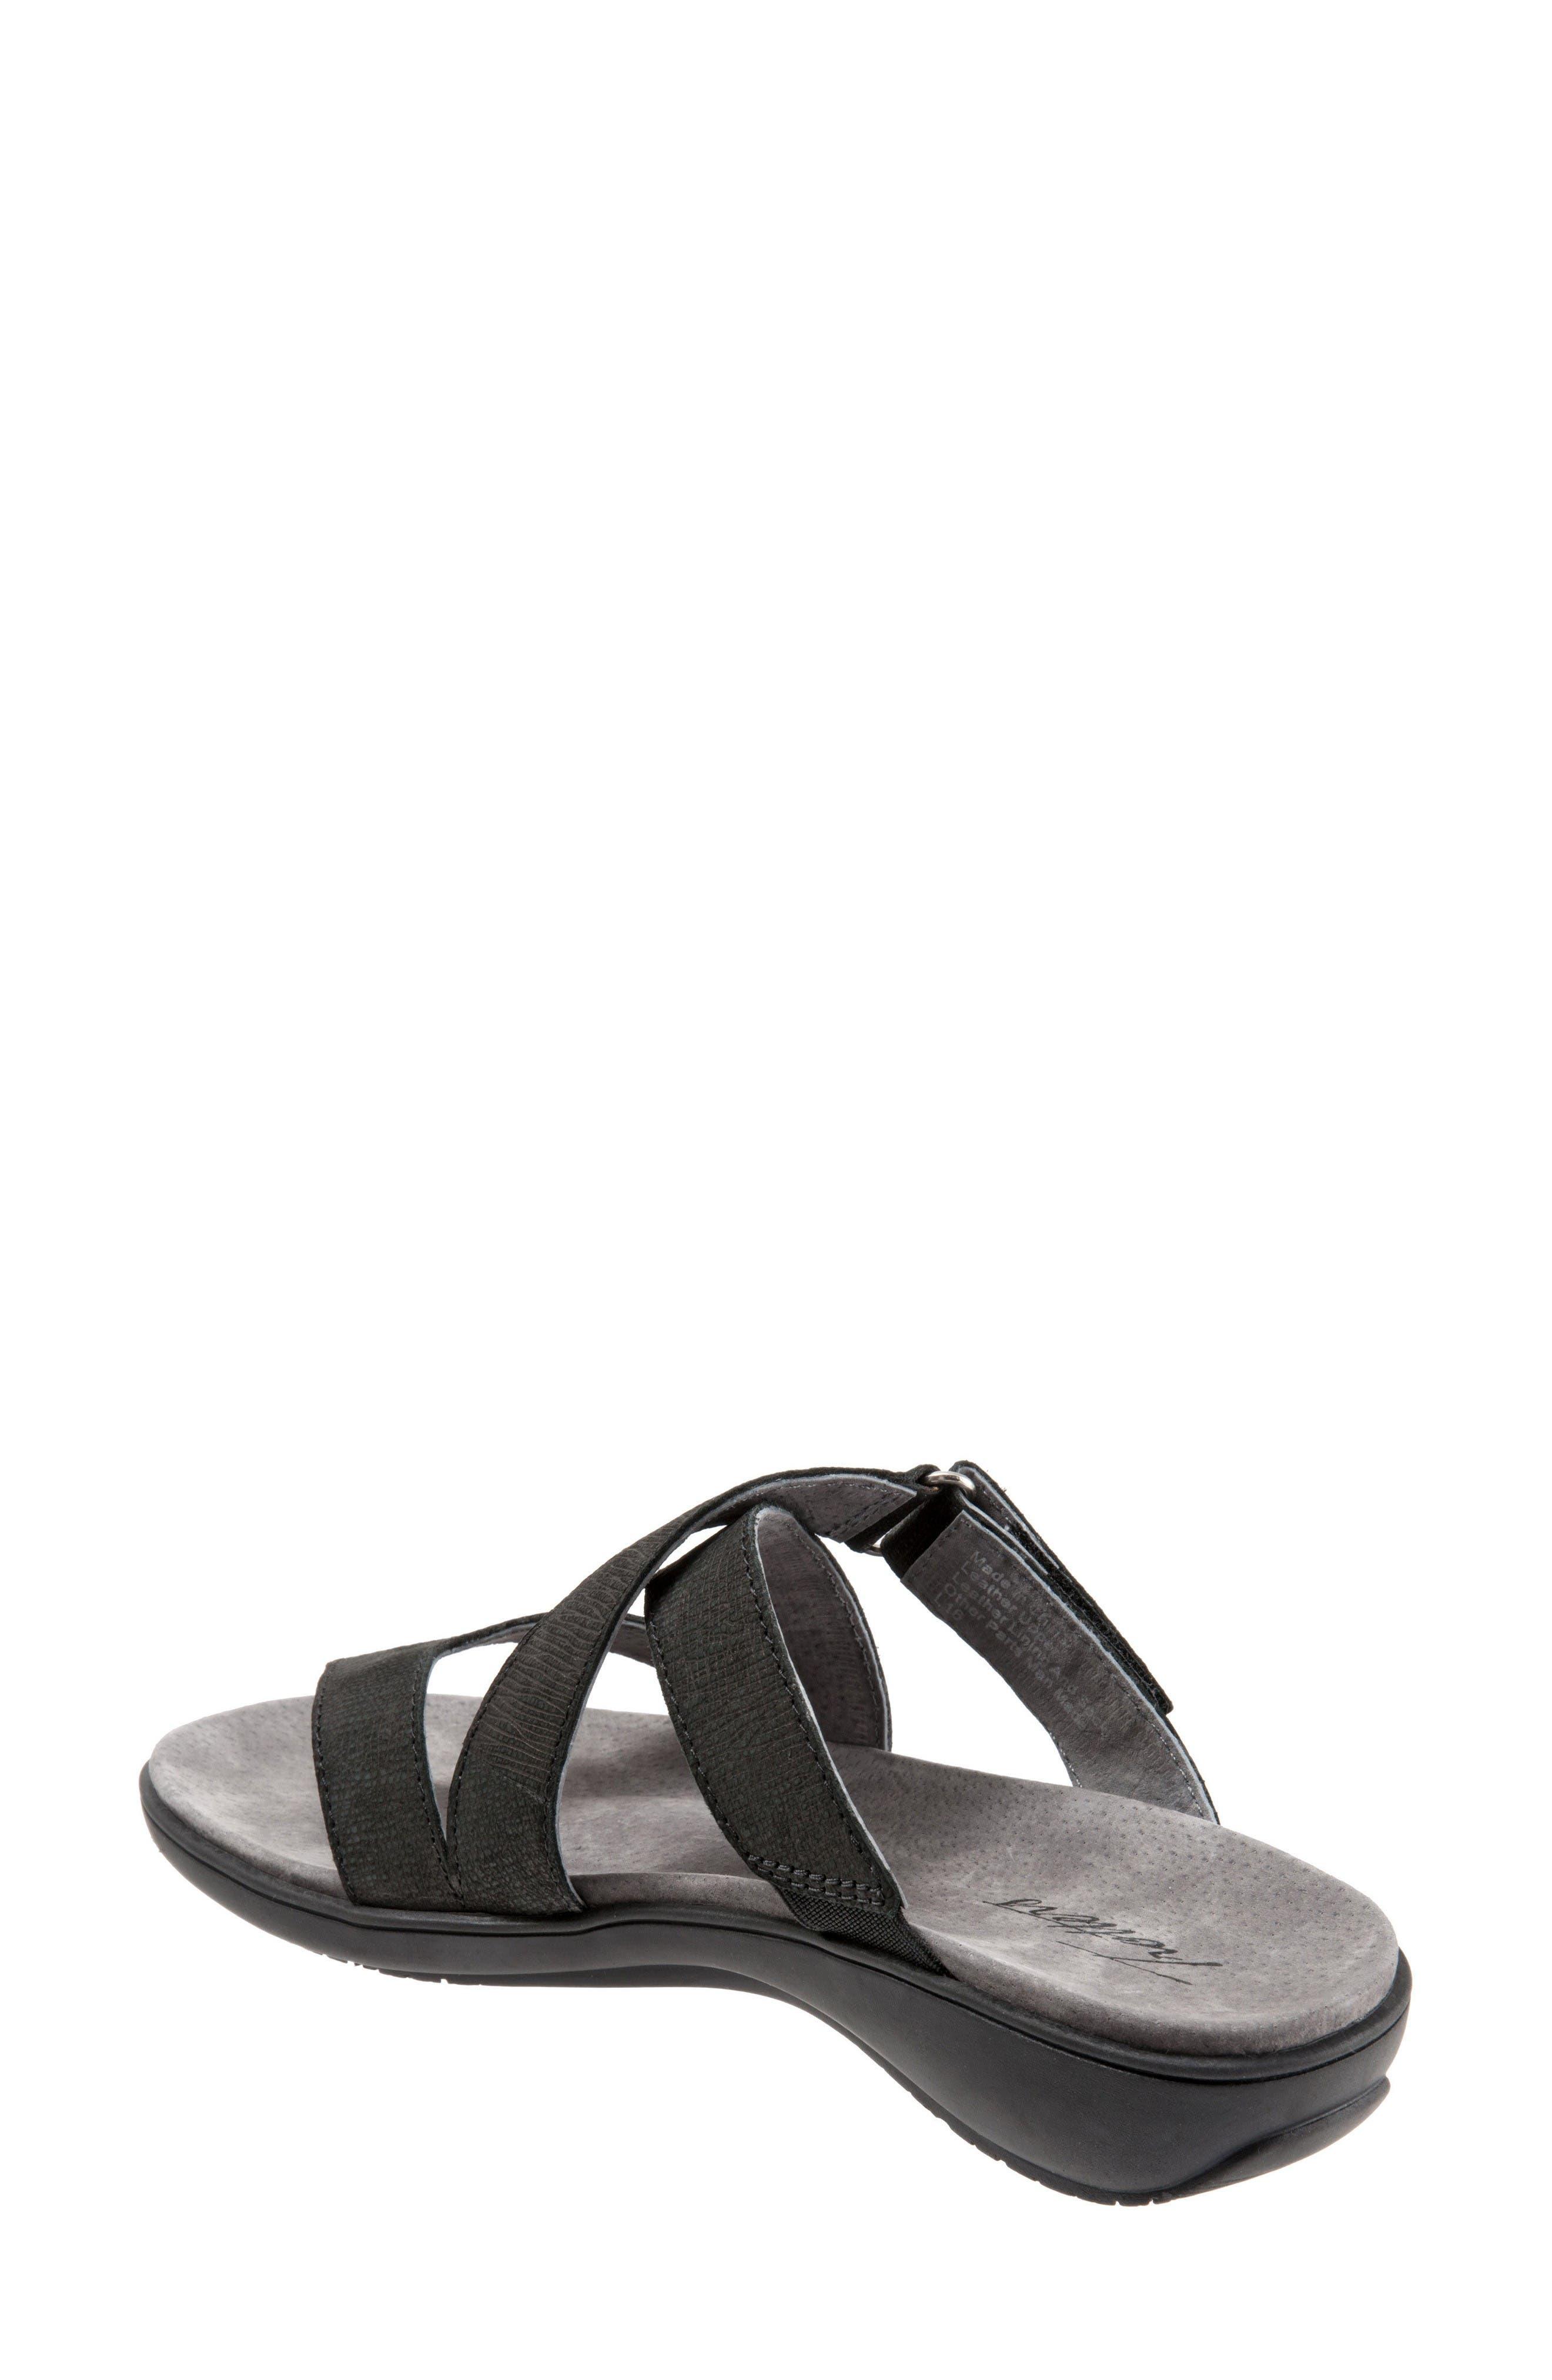 Alternate Image 2  - Trotters Komet Thong Sandal (Women)